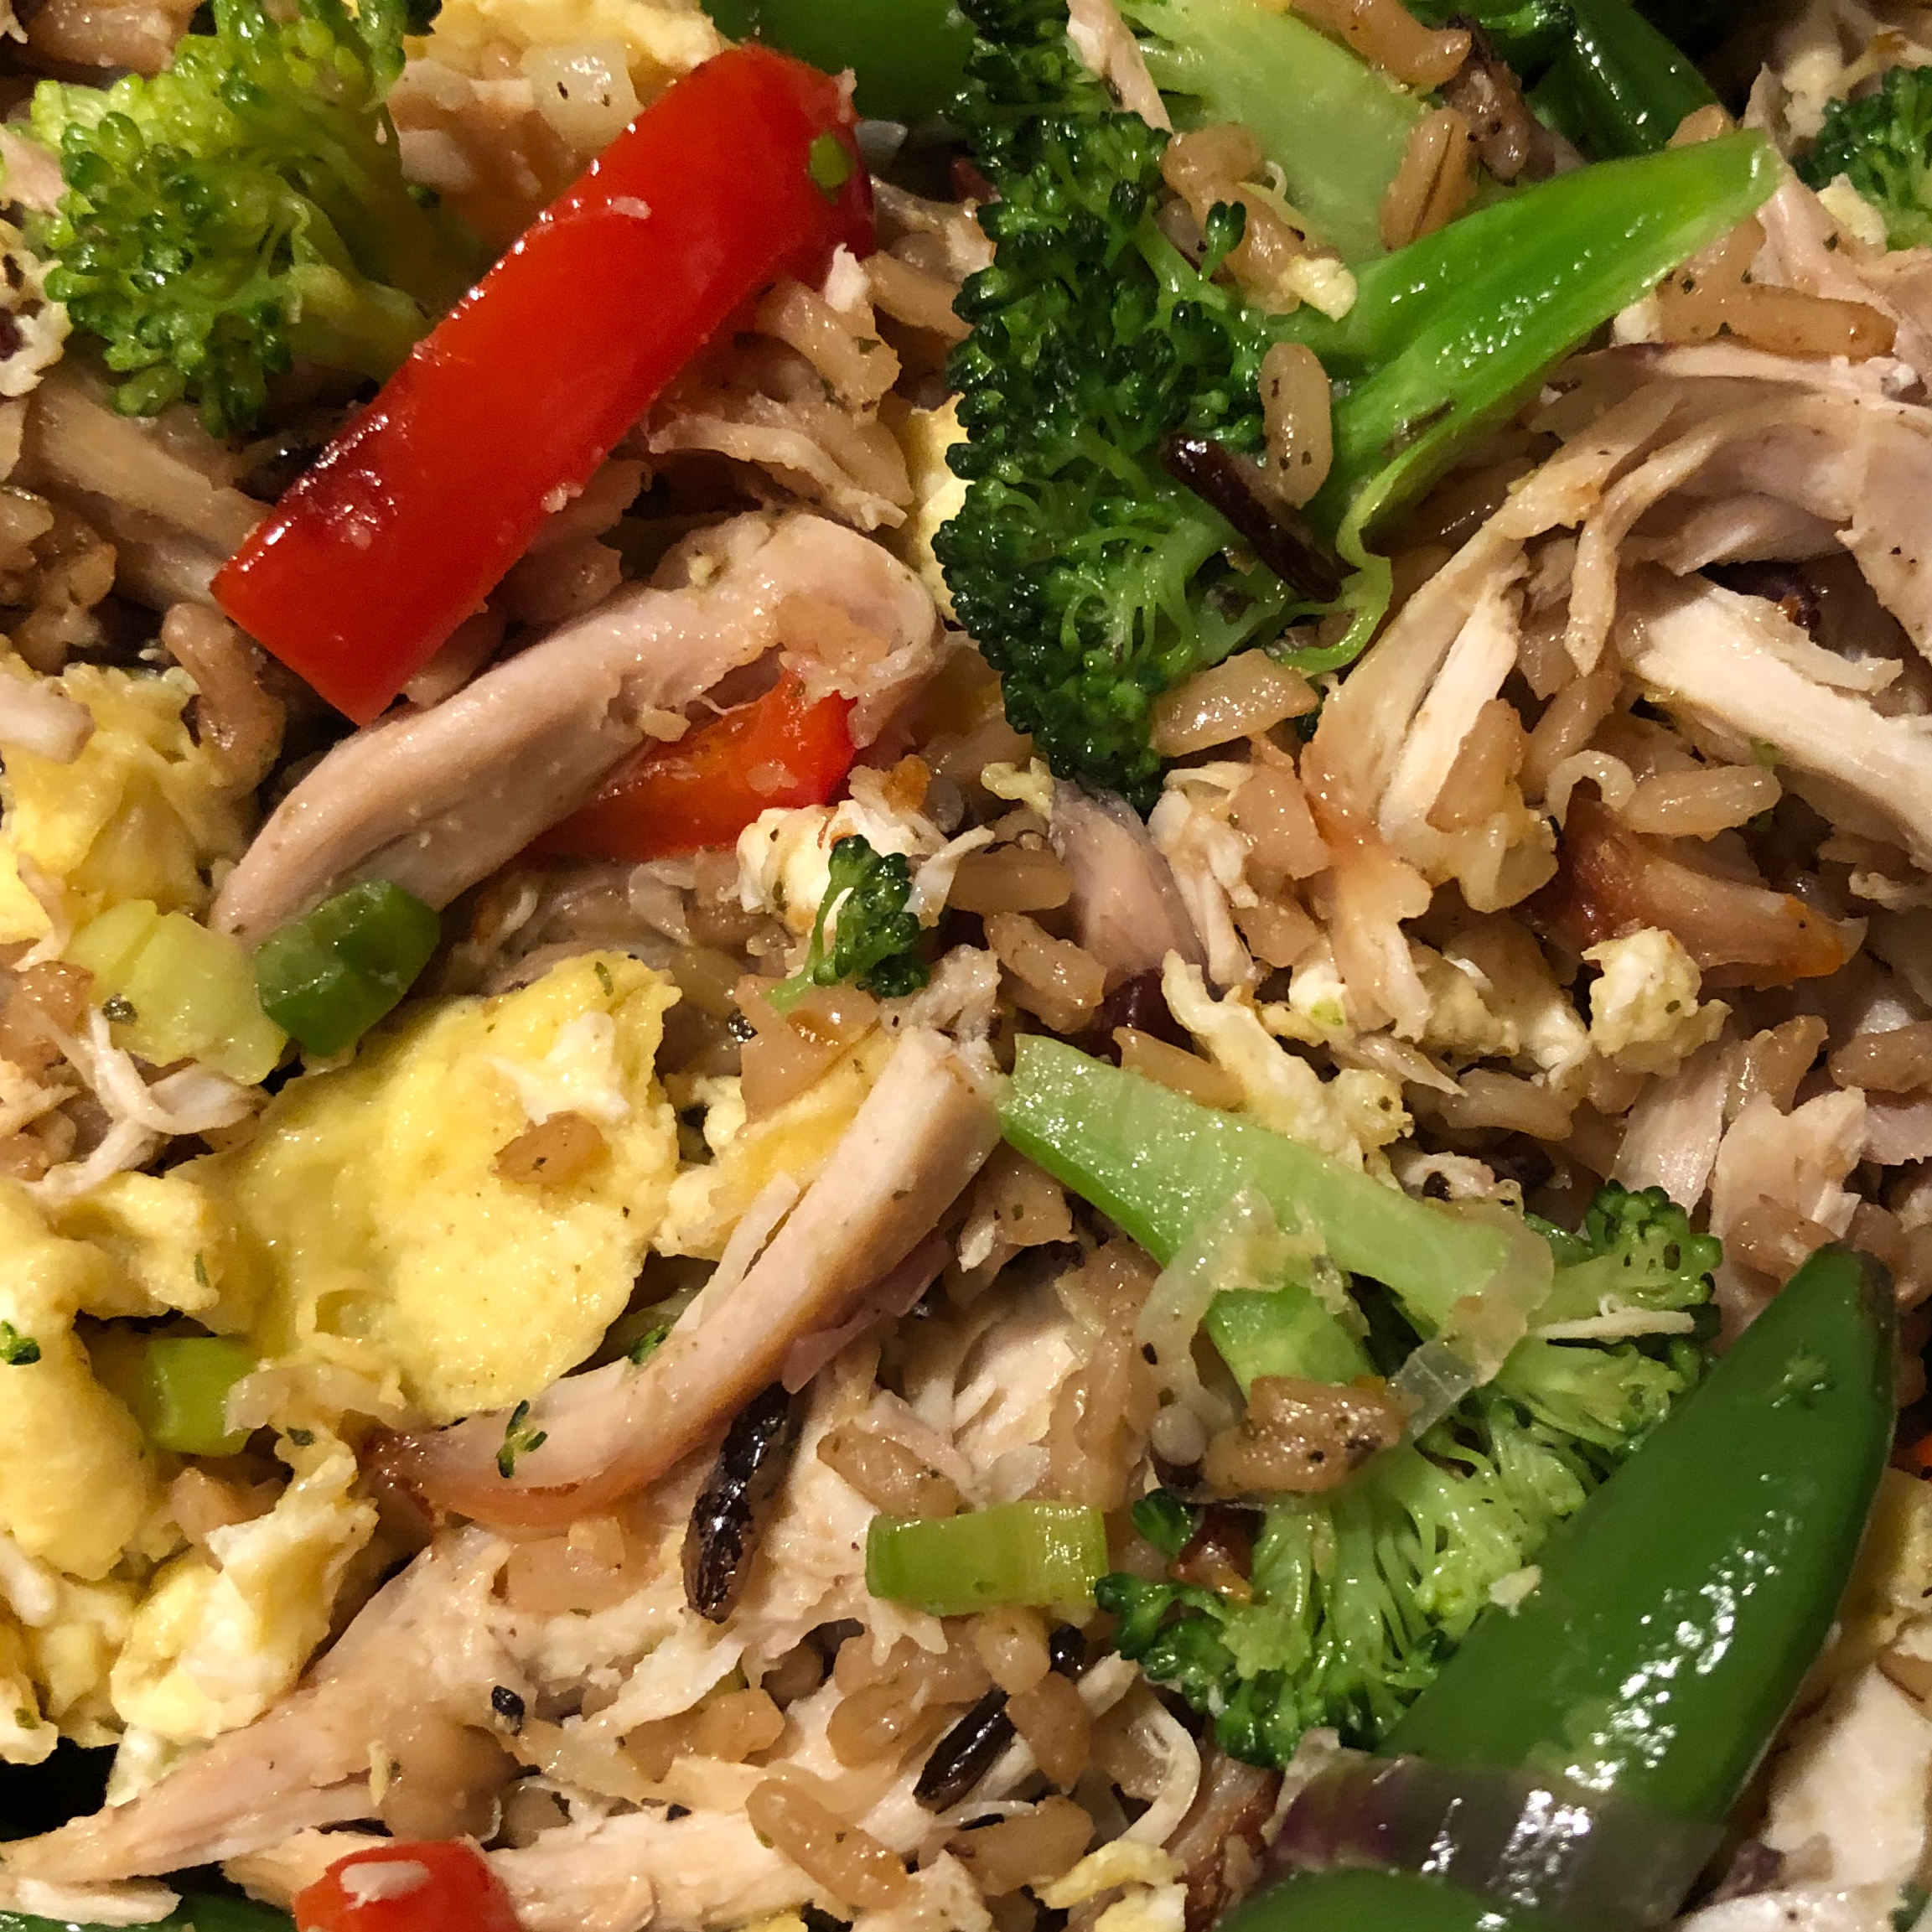 Chicken and Multi-Grain Stir Fry